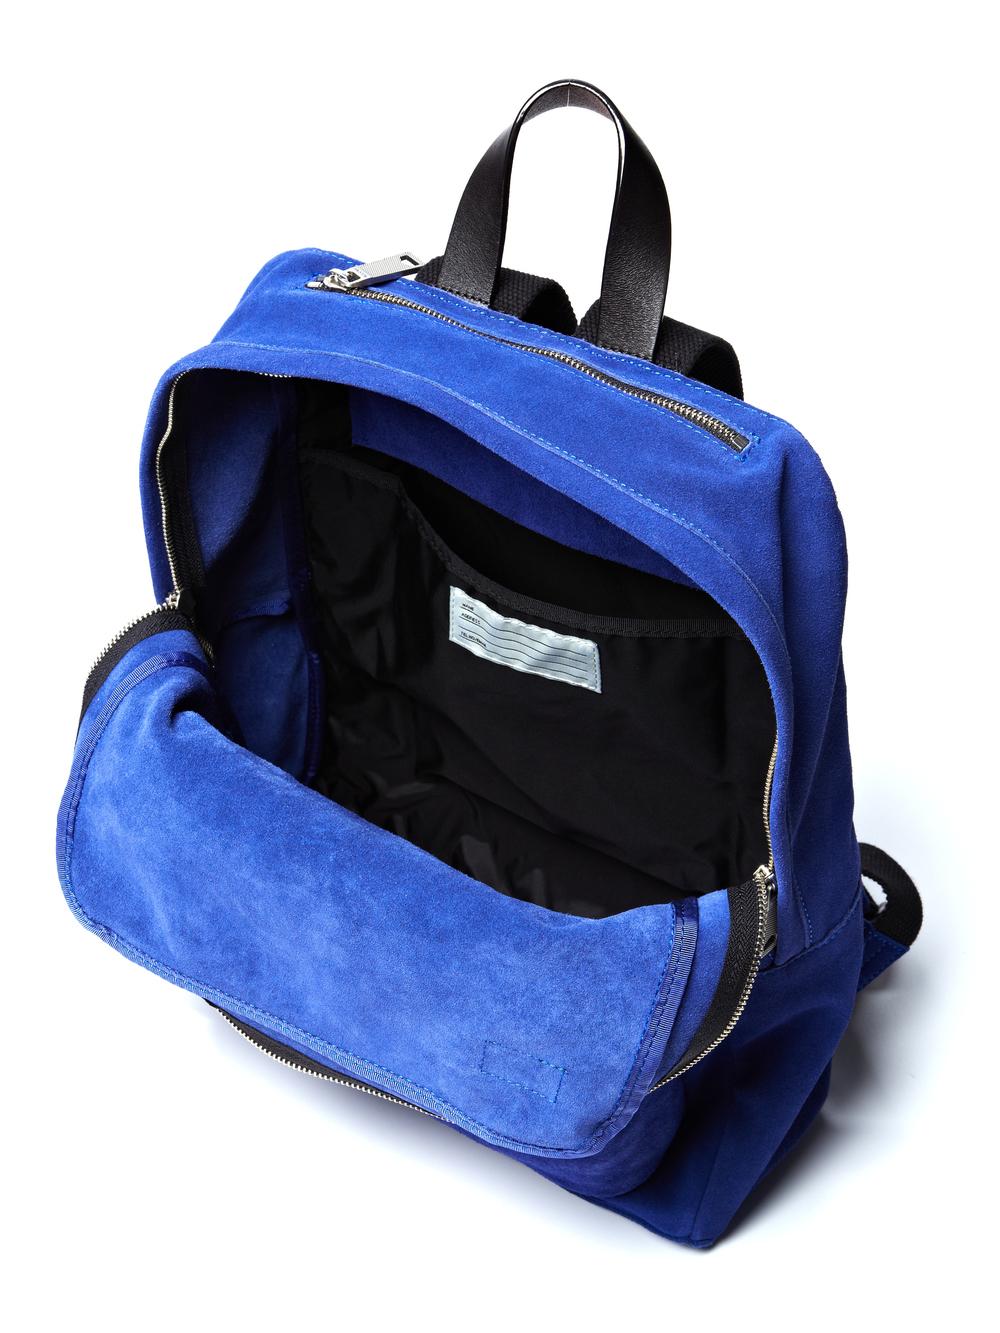 Backpack_OVERHEAD_1_205.jpg